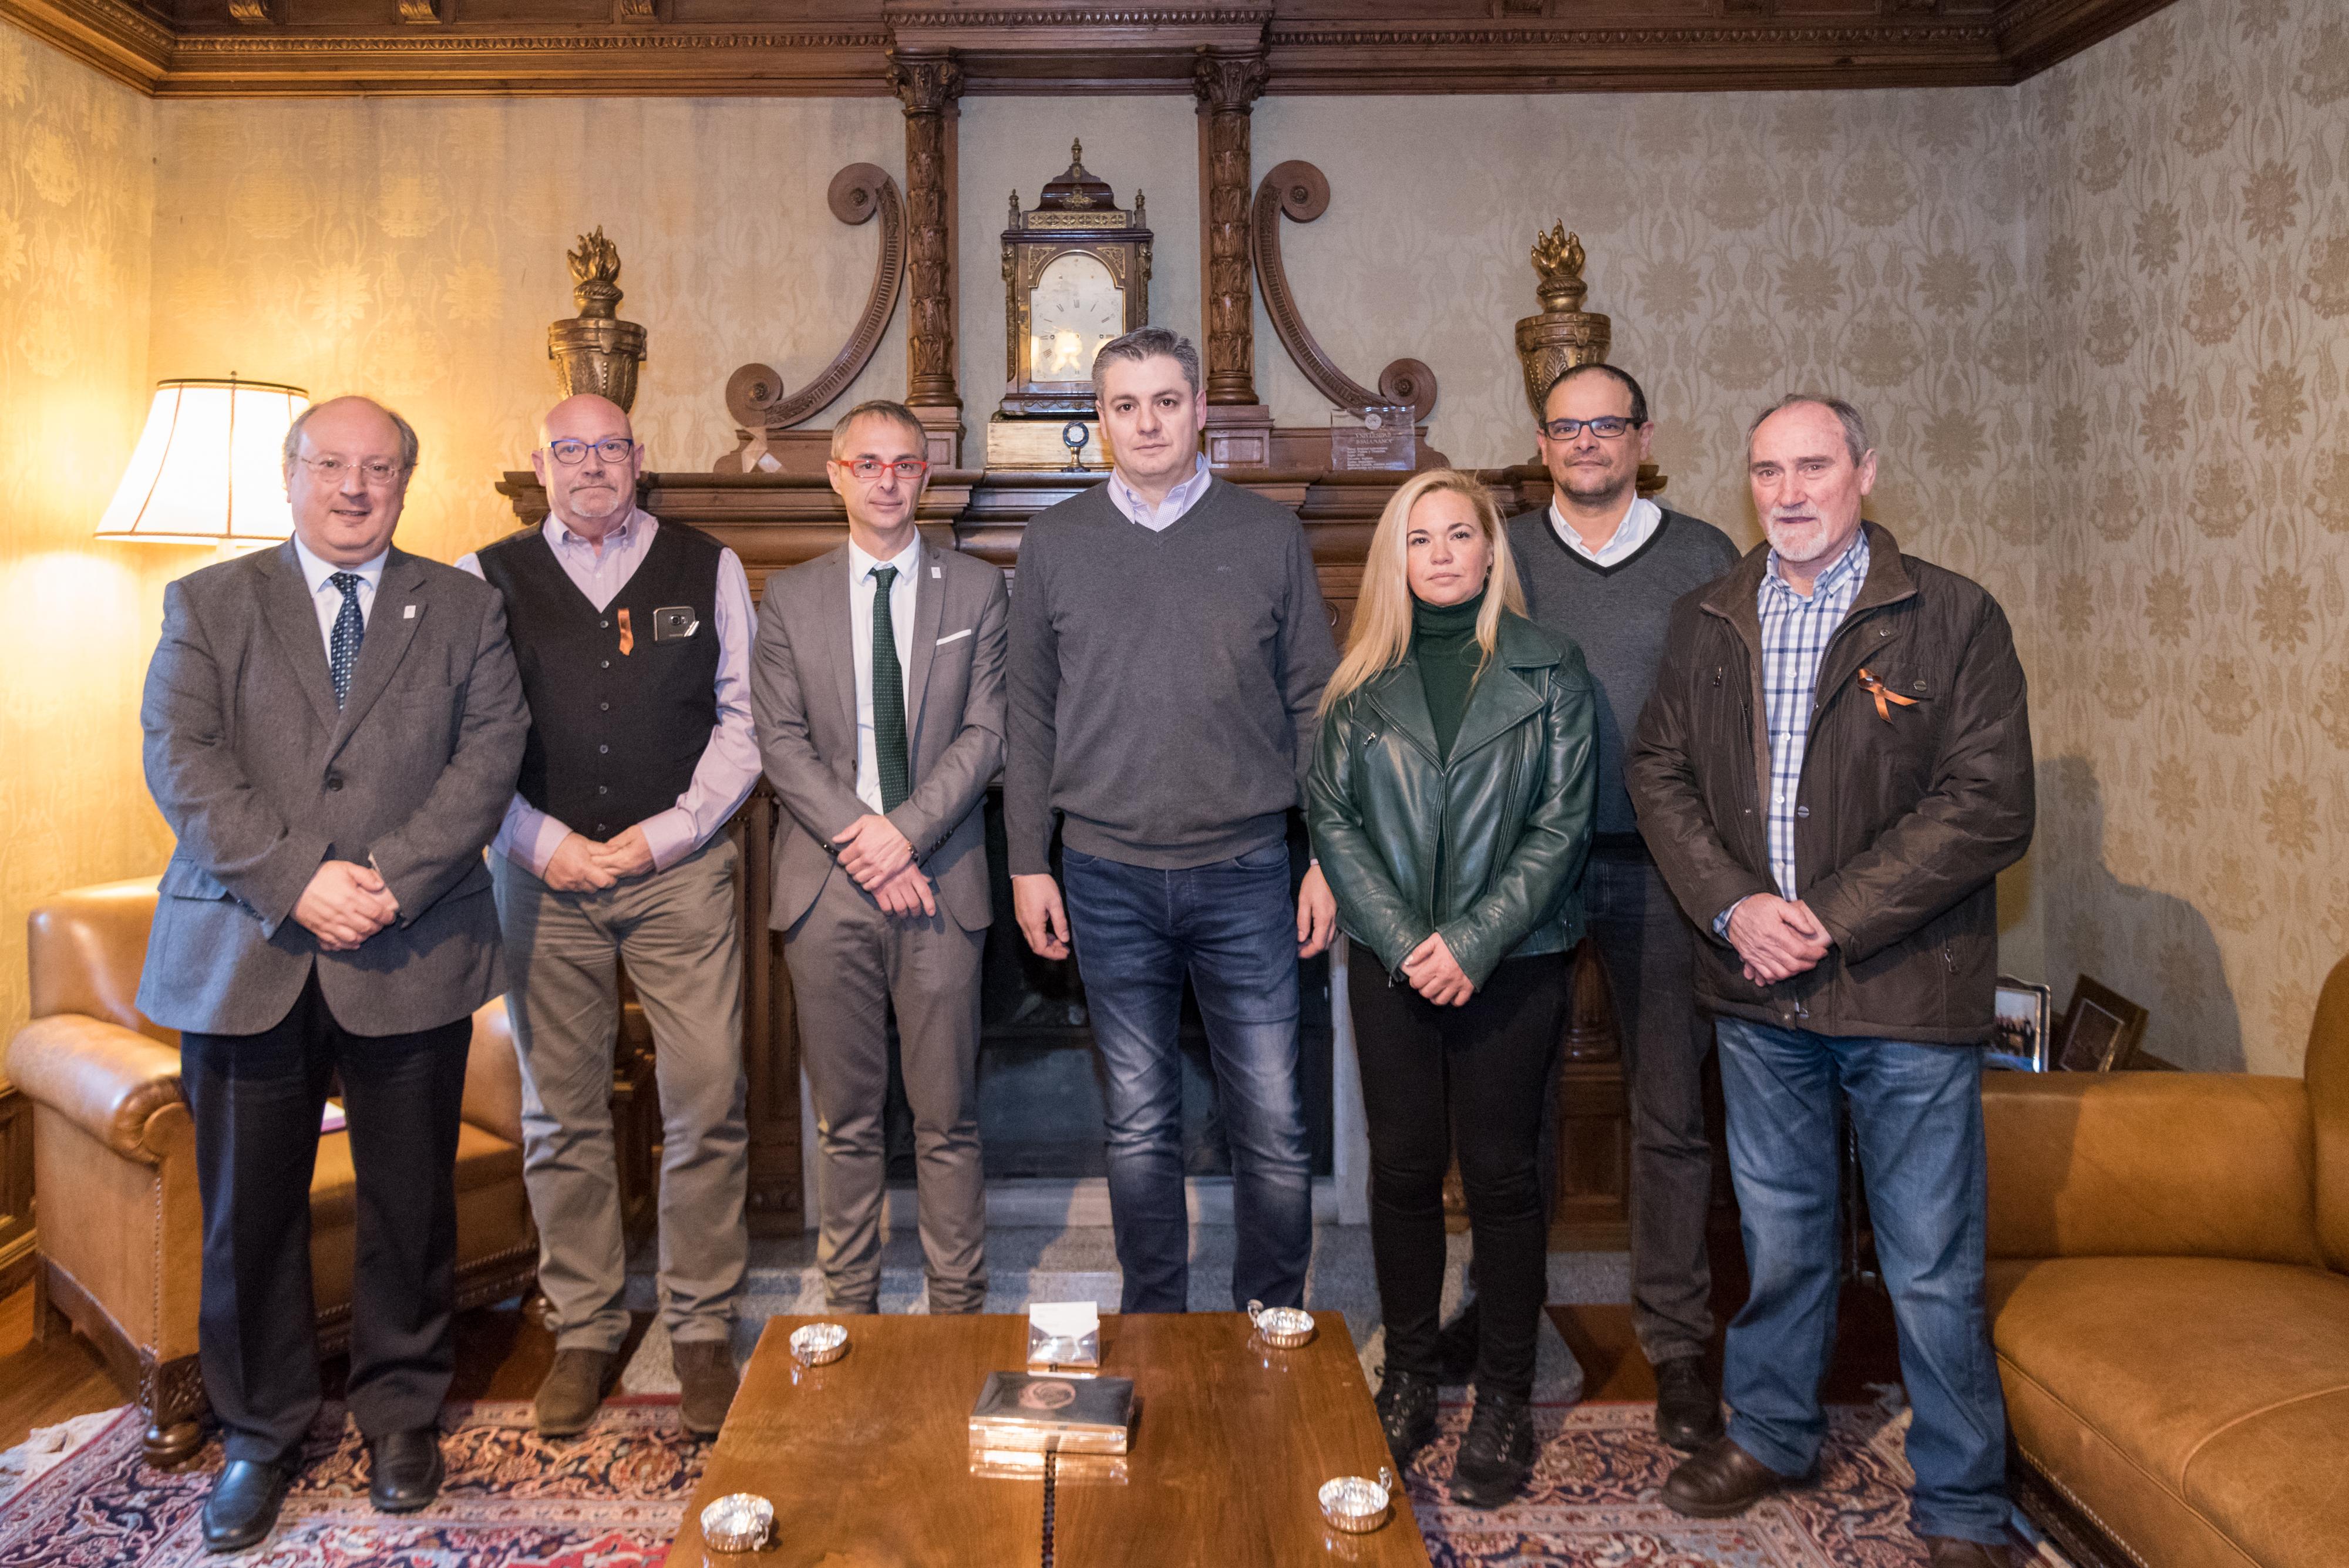 El rector de la Universidad de Salamanca recibe al consejo provincial de UGT